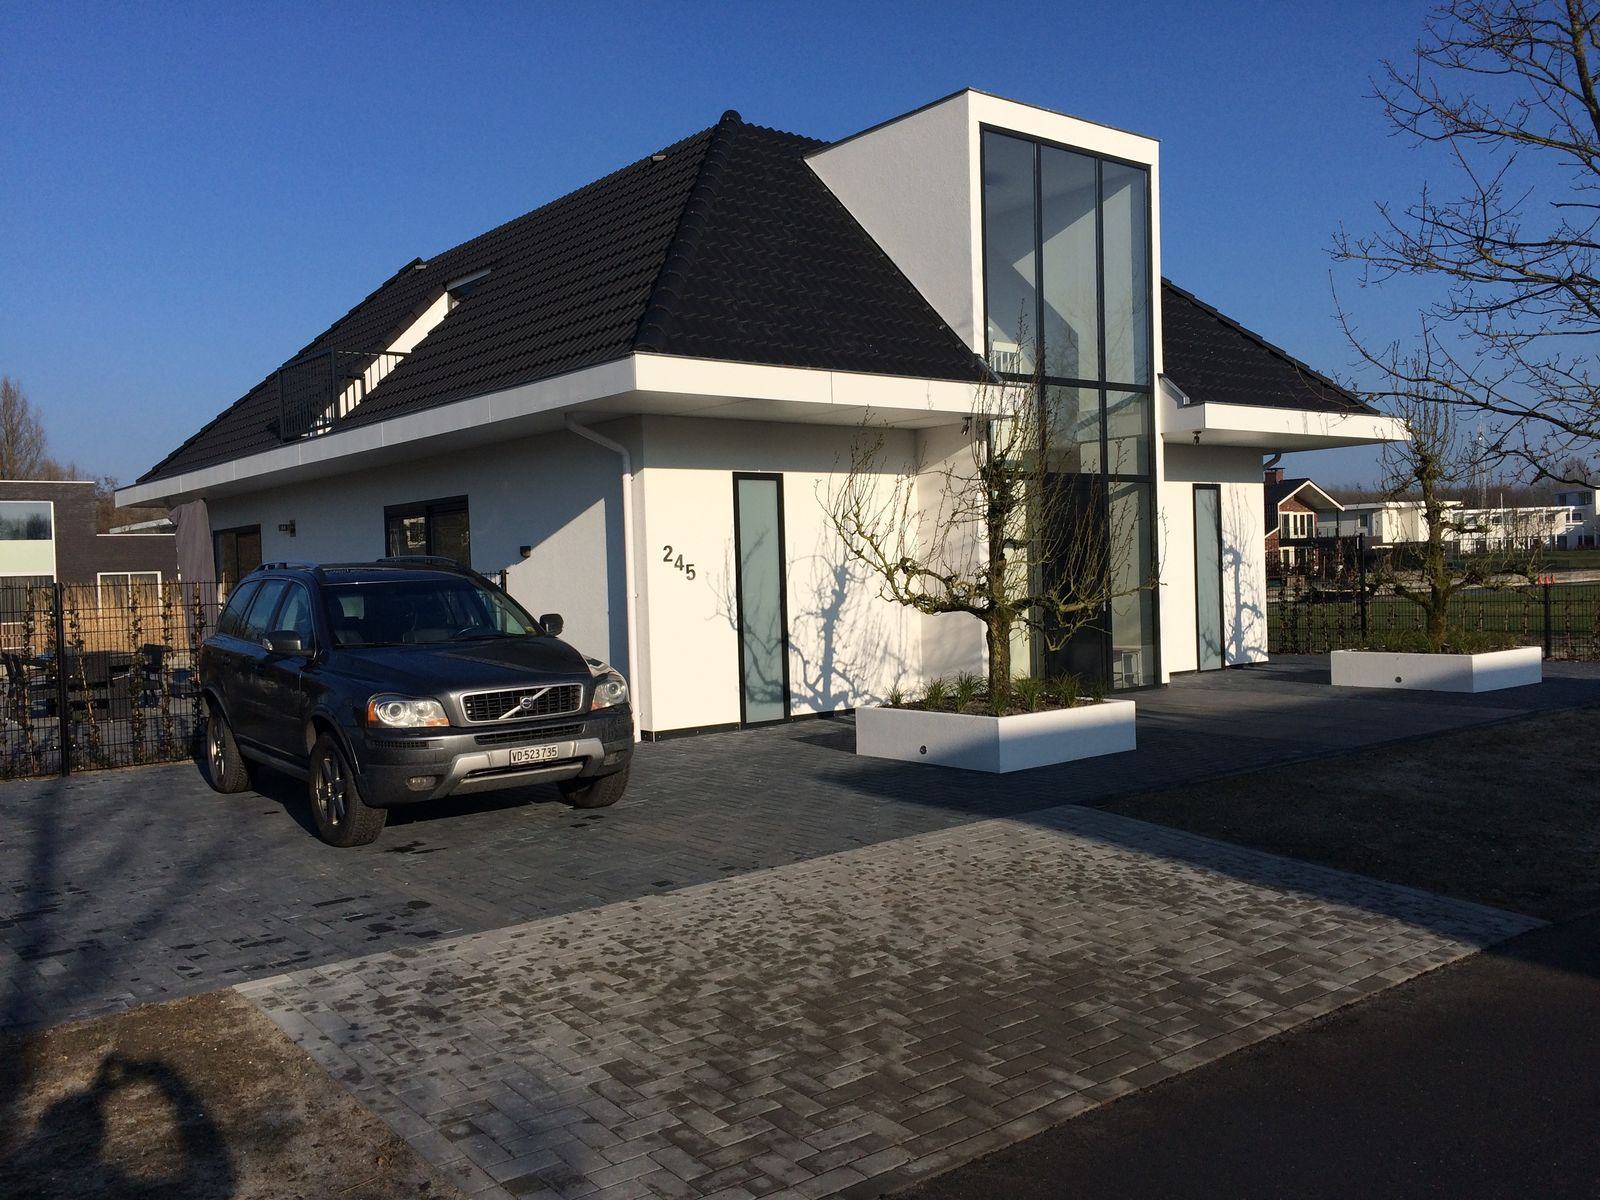 Villa Zon 245